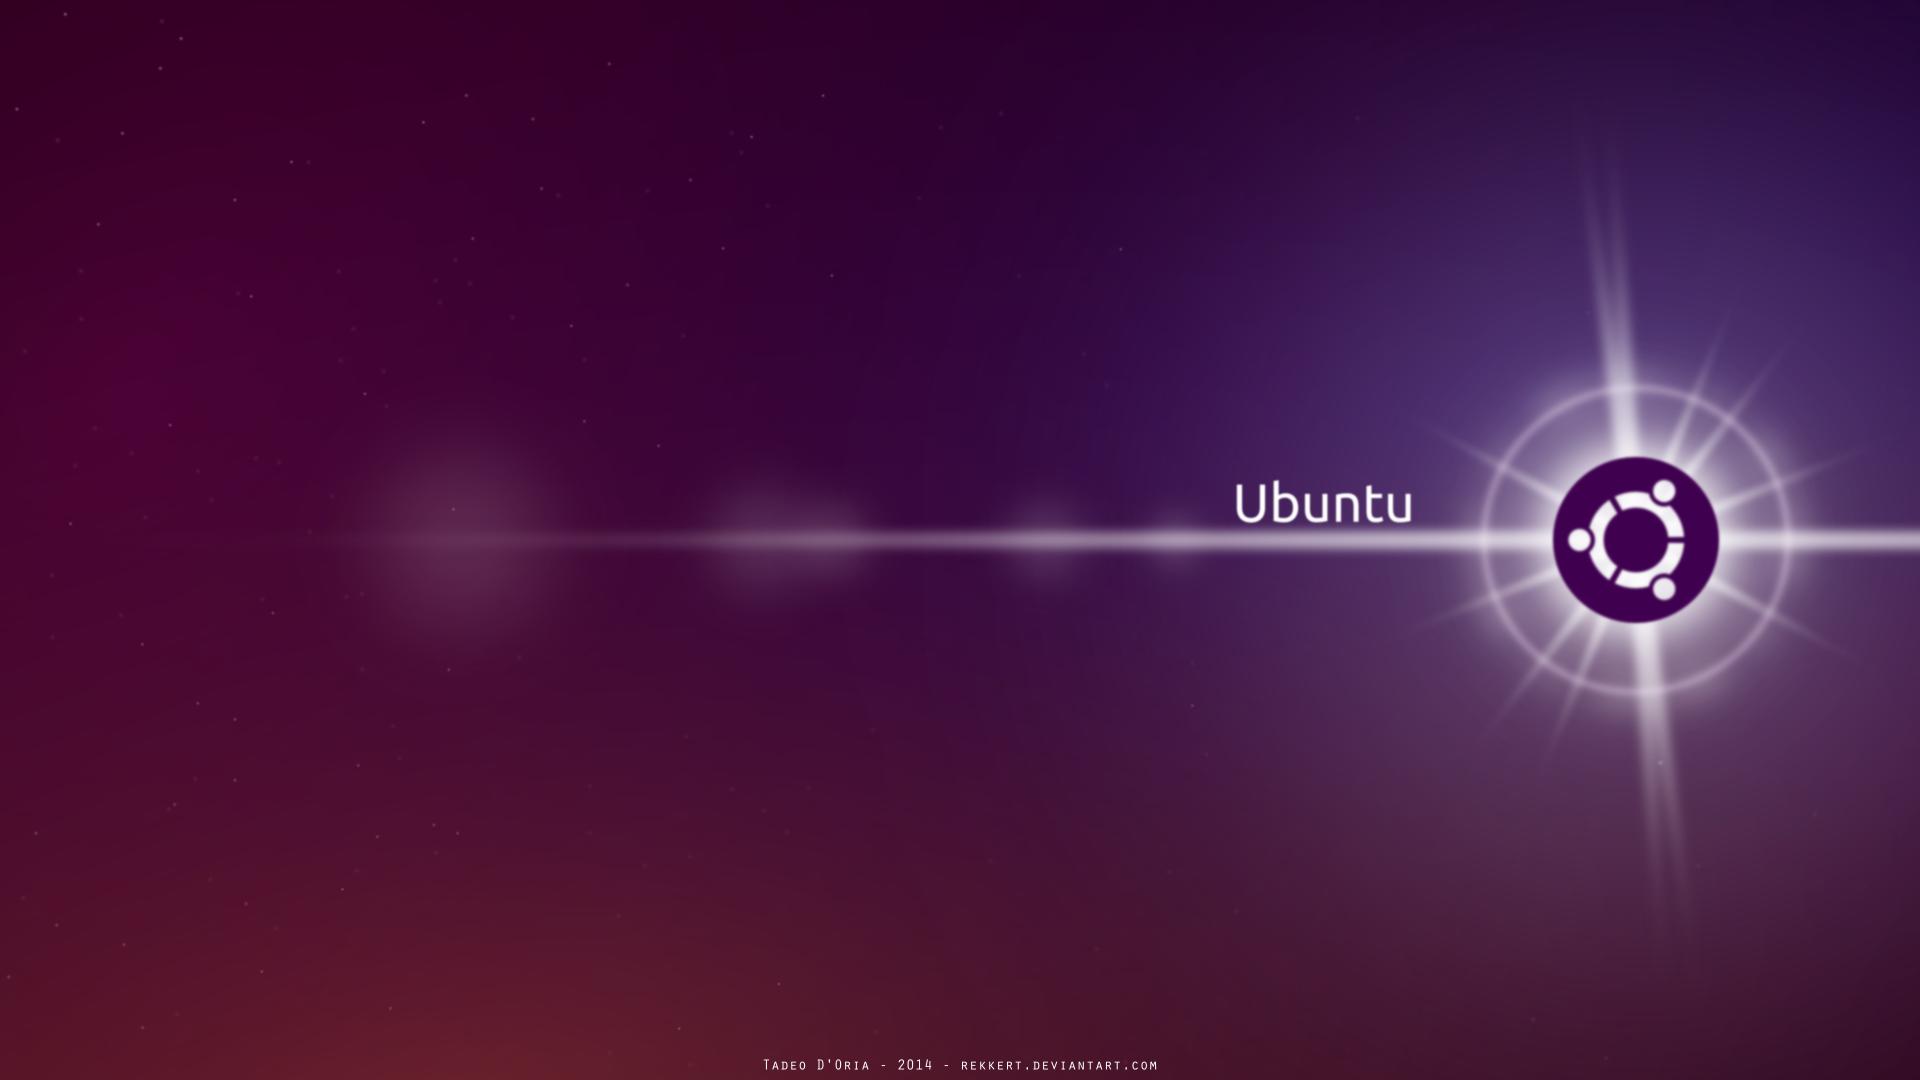 ubuntu wallpapers 1828 hdwpro